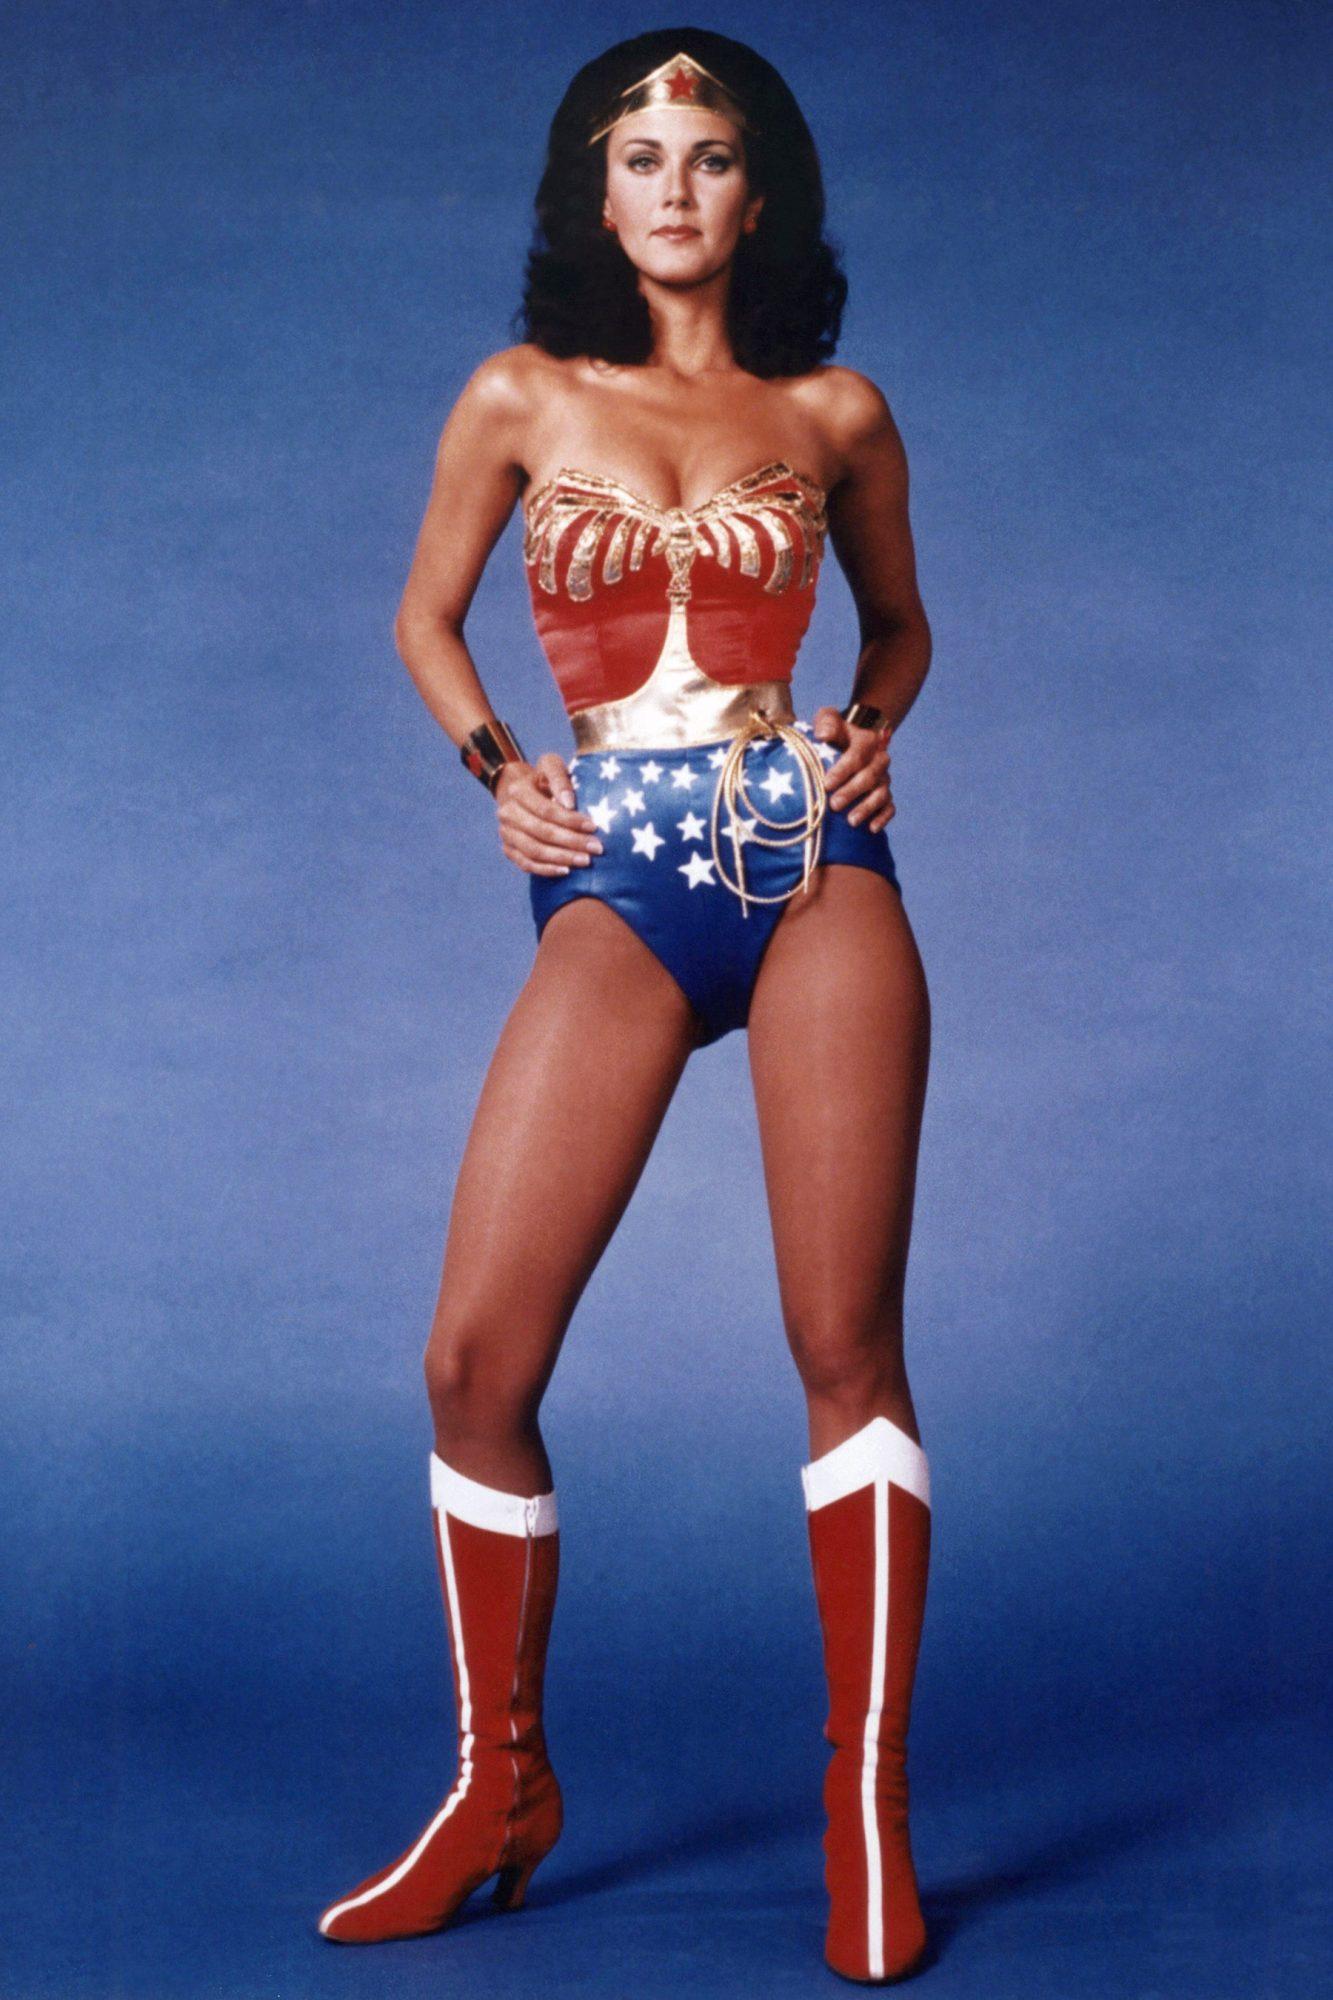 WONDER WOMAN, Lynda Carter, 1976-1979